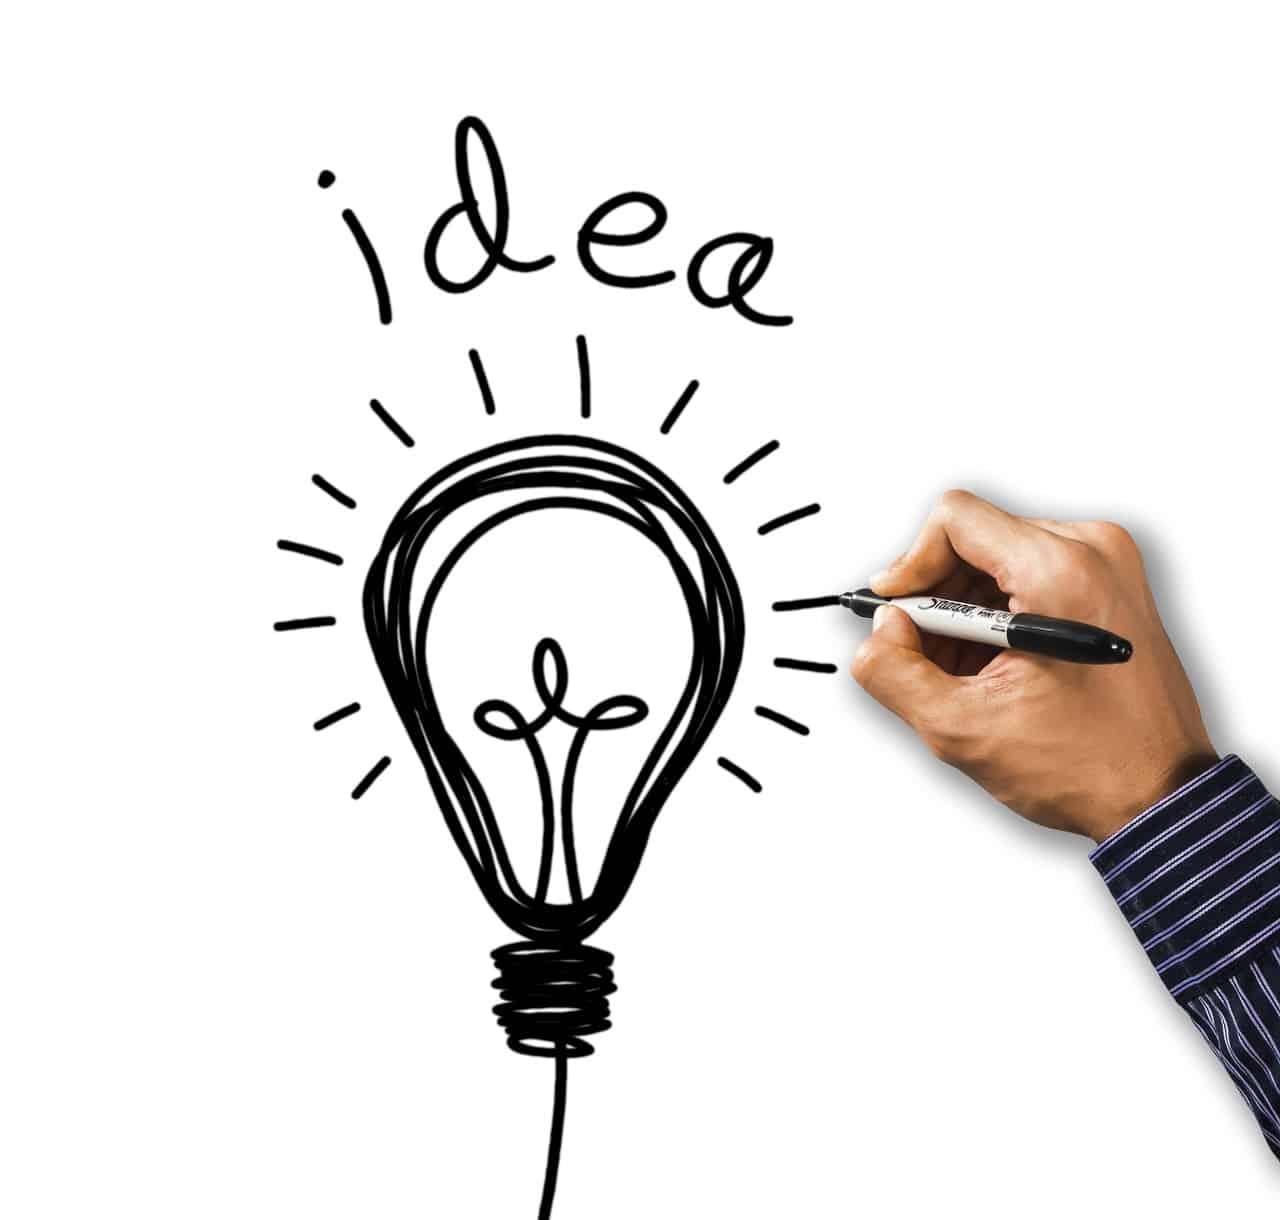 creare un business online